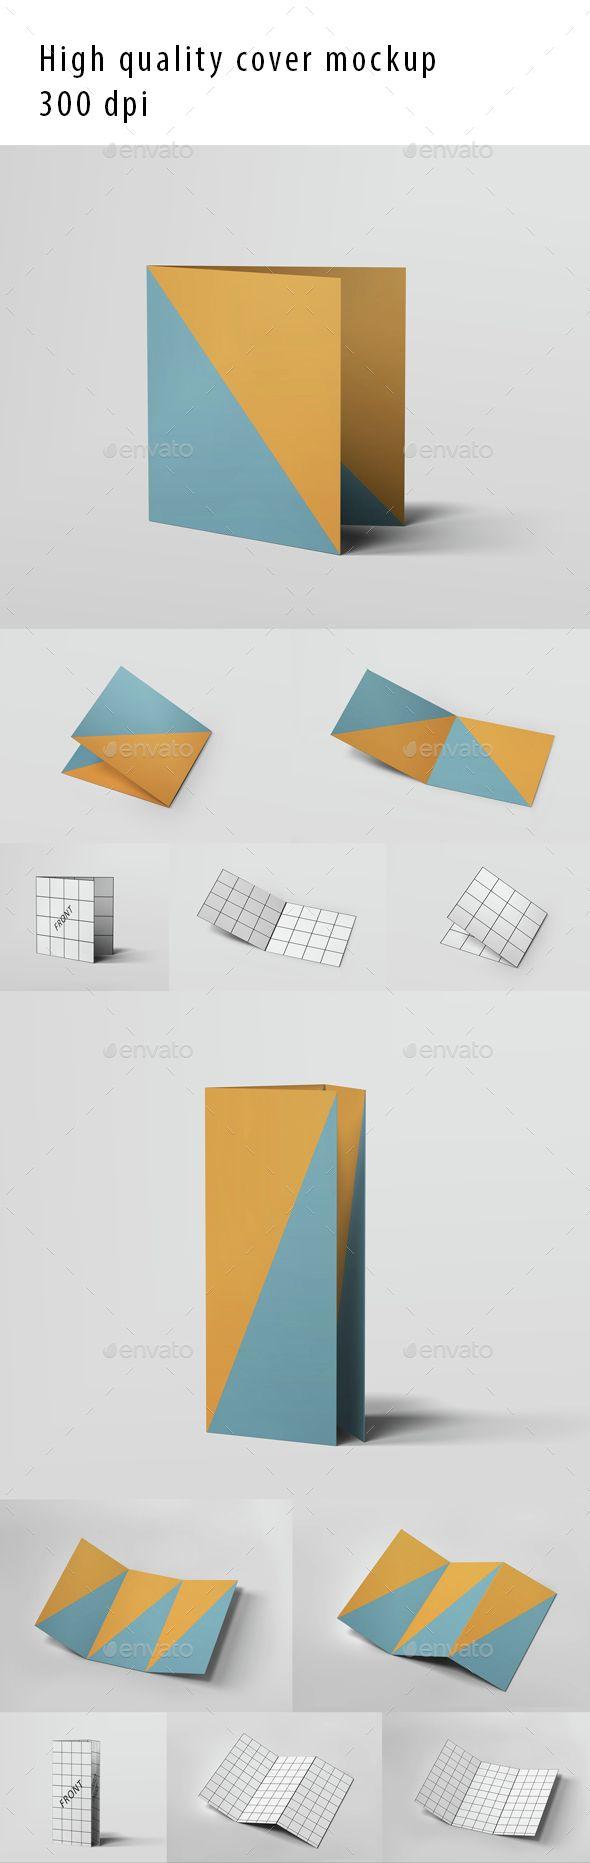 Tri Fold And Half Fold Brochure Mockup  Mockup Tri Fold And